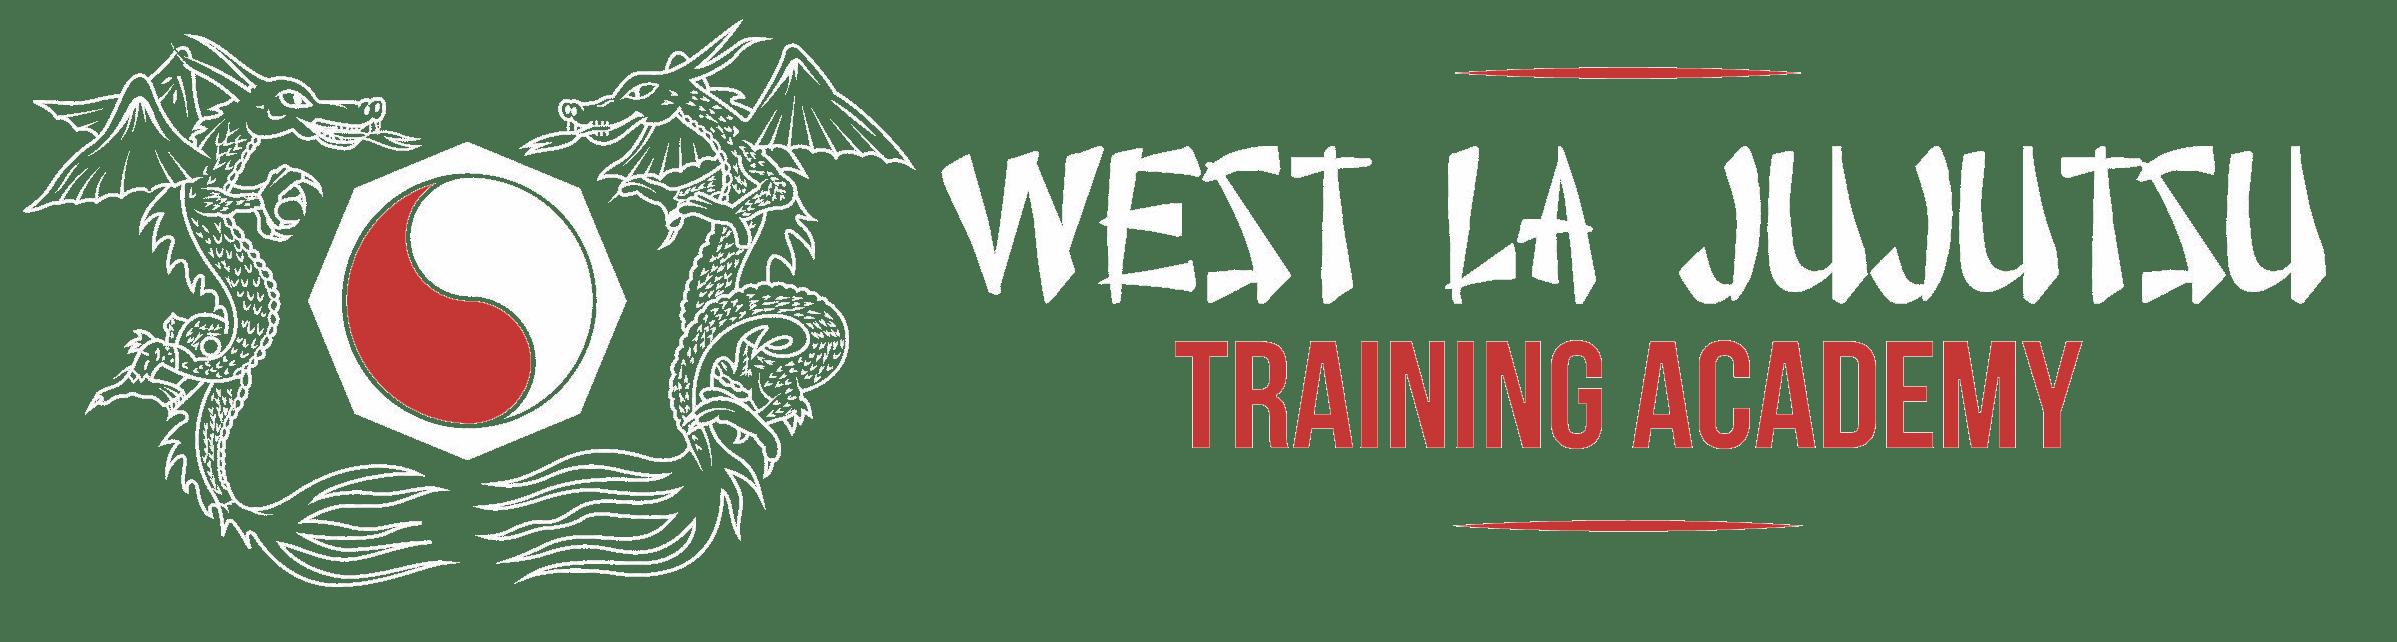 Logo1, West Louisiana Jujutsu Training Academy Leesville